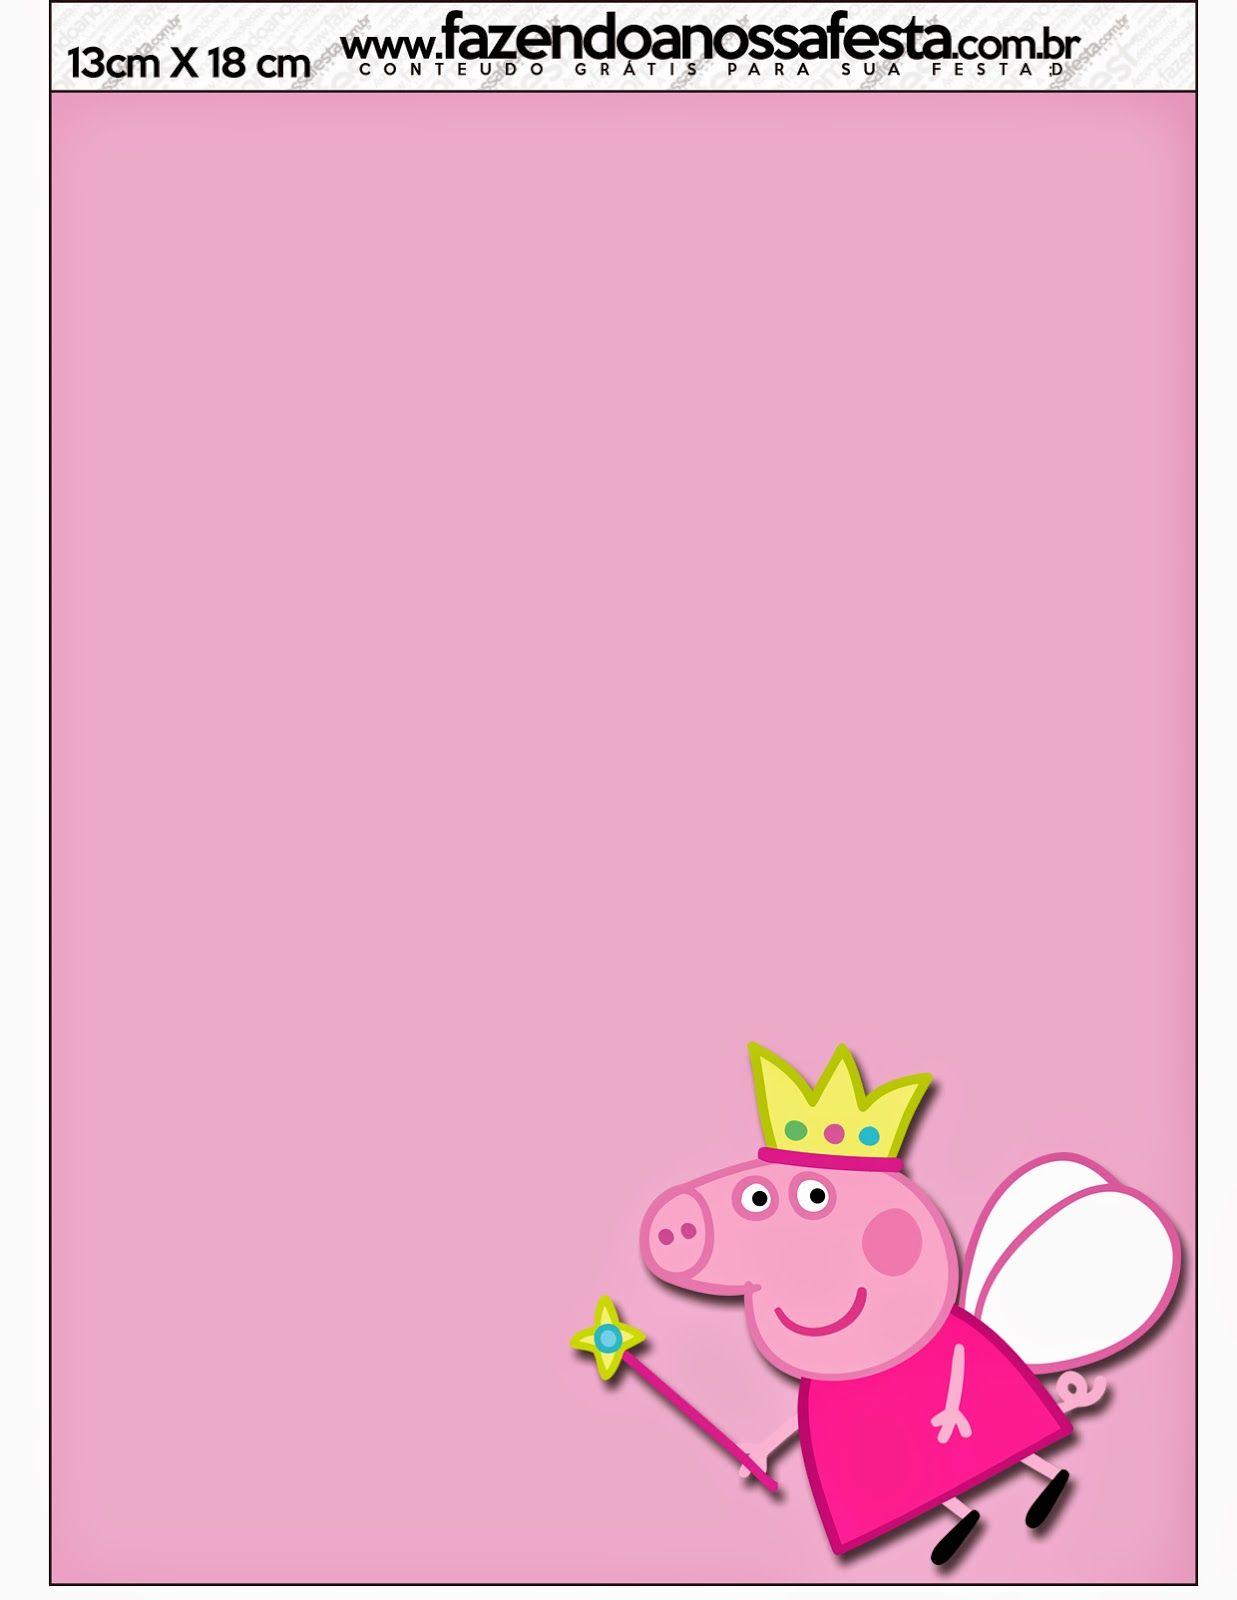 Peppa Pig Fairy: Free Printable Invitations. | Peppa Pig Party ...